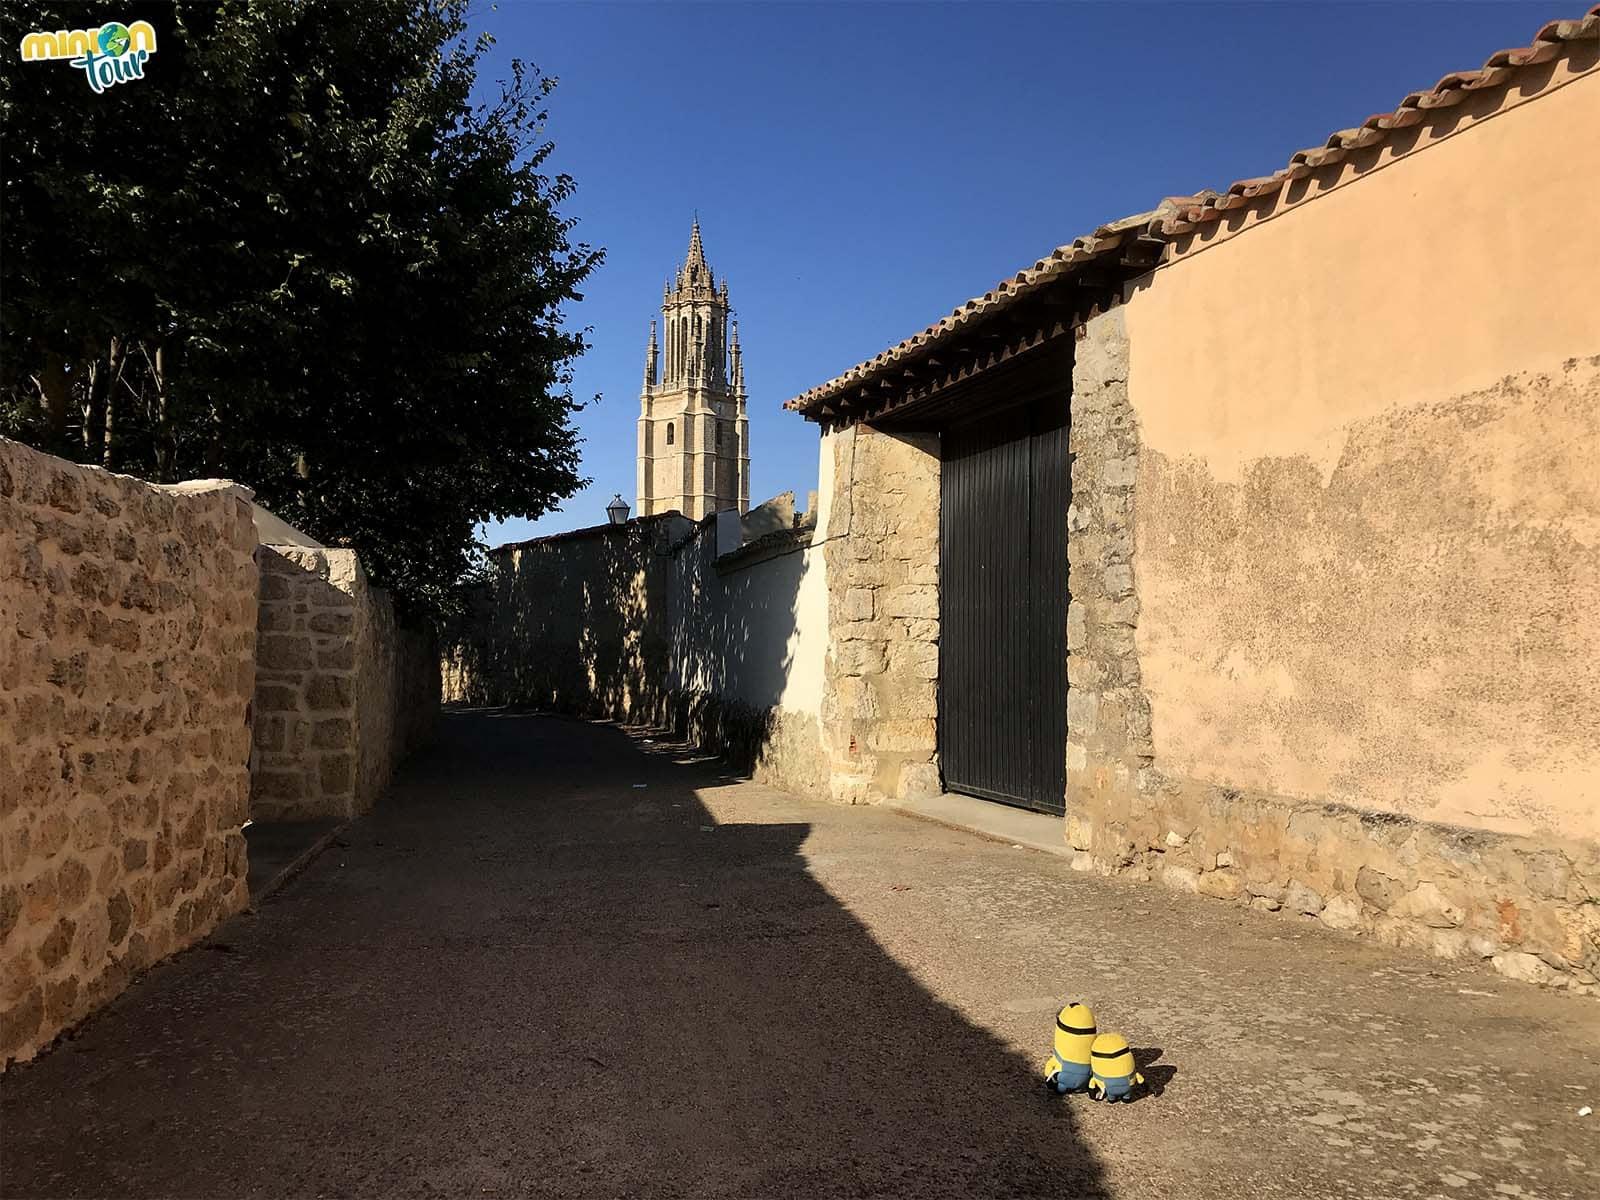 La Colegiata de San Miguel de Ampudia